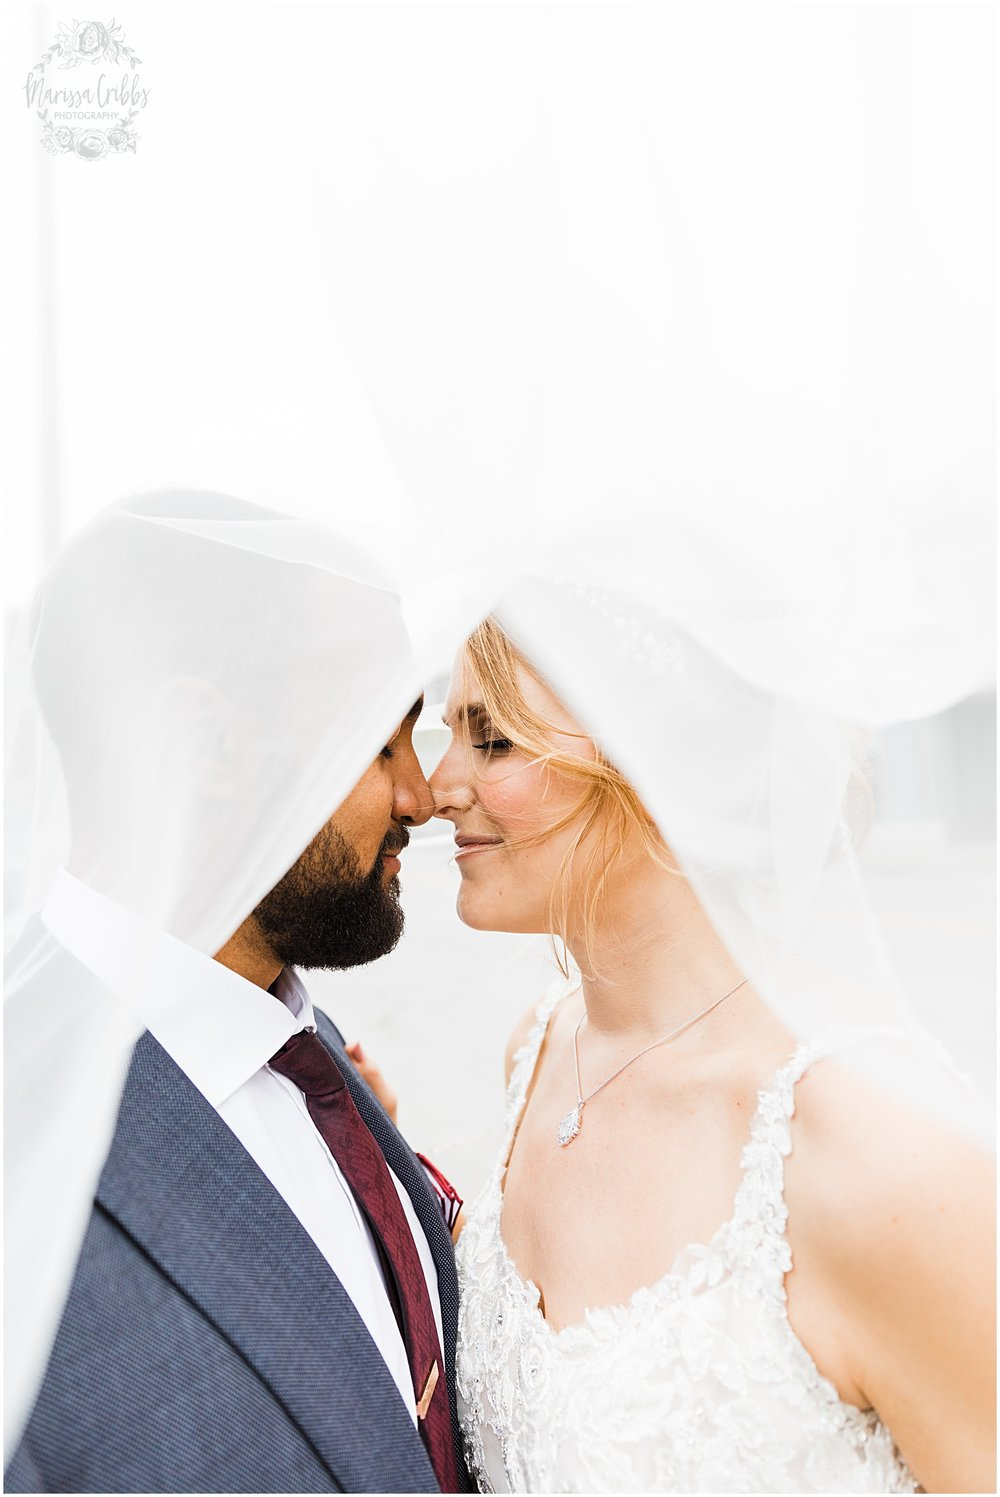 BAUER WEDDING | KELSEA & JUSTIN | MARISSA CRIBBS PHOTOGRAPHY_6544.jpg